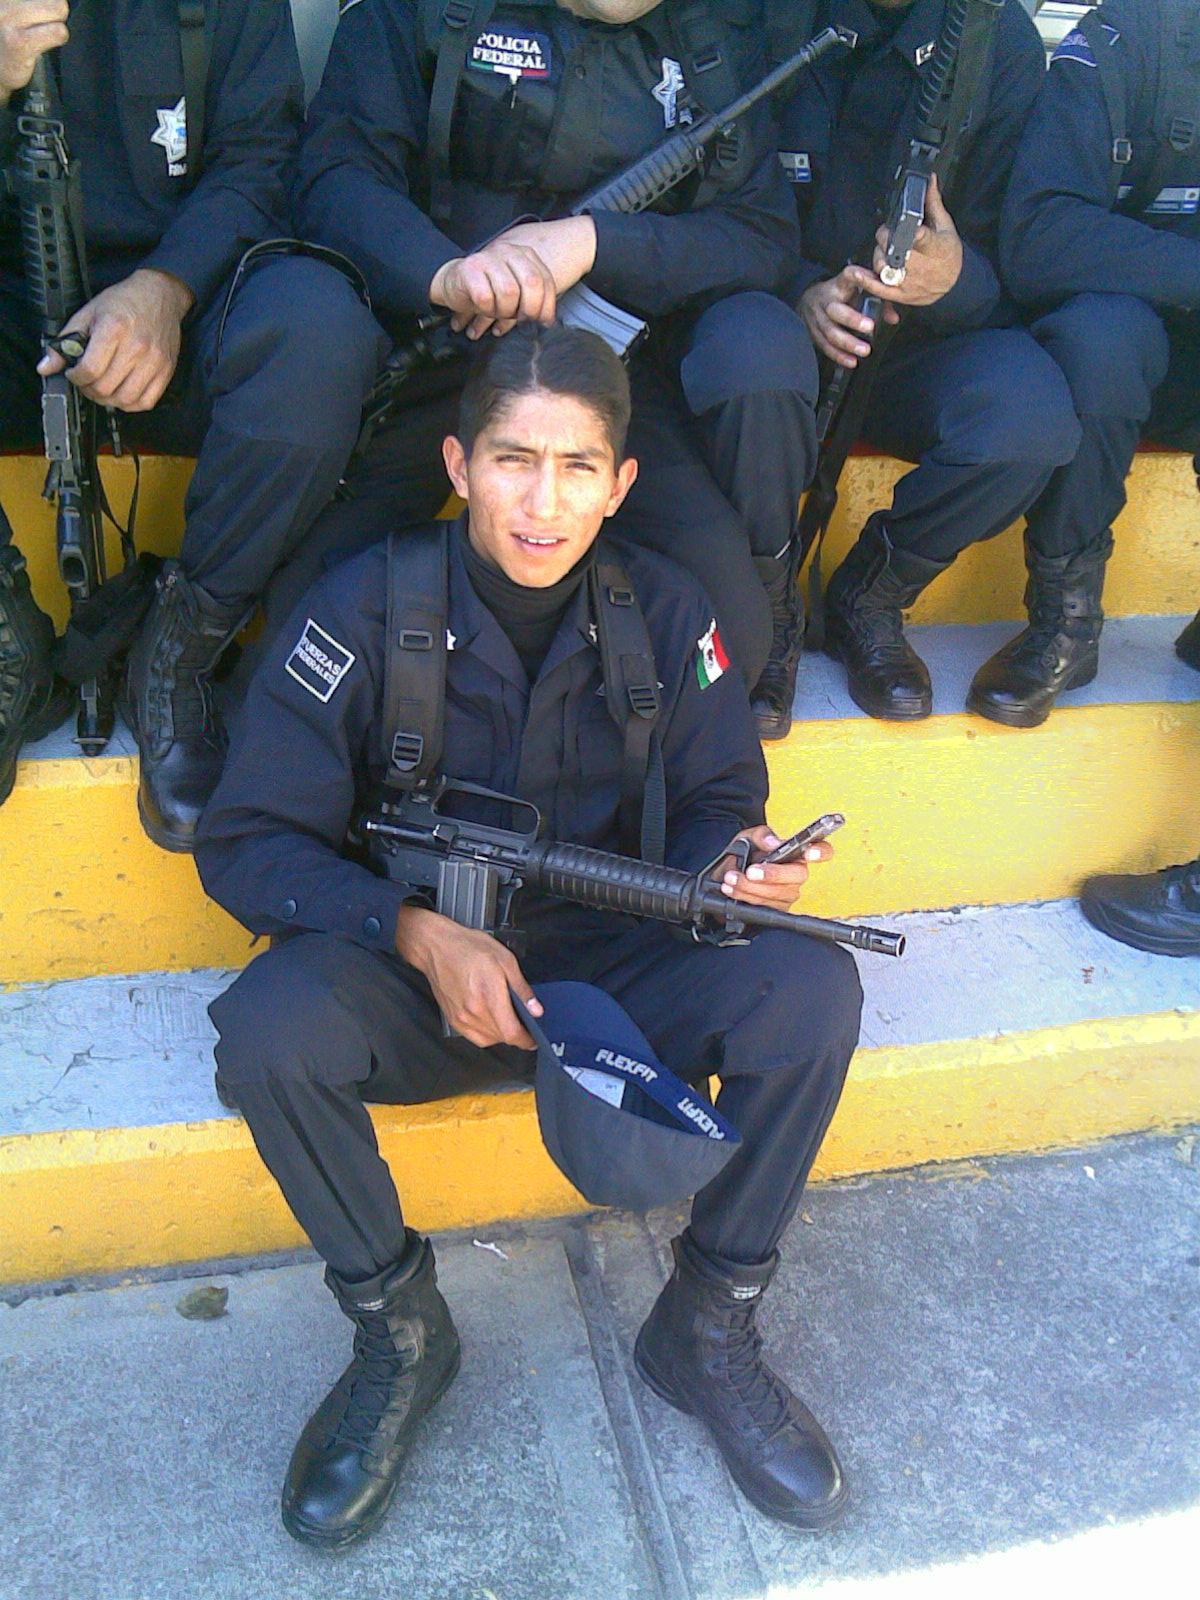 Photo of Juan from Araceli's wall.